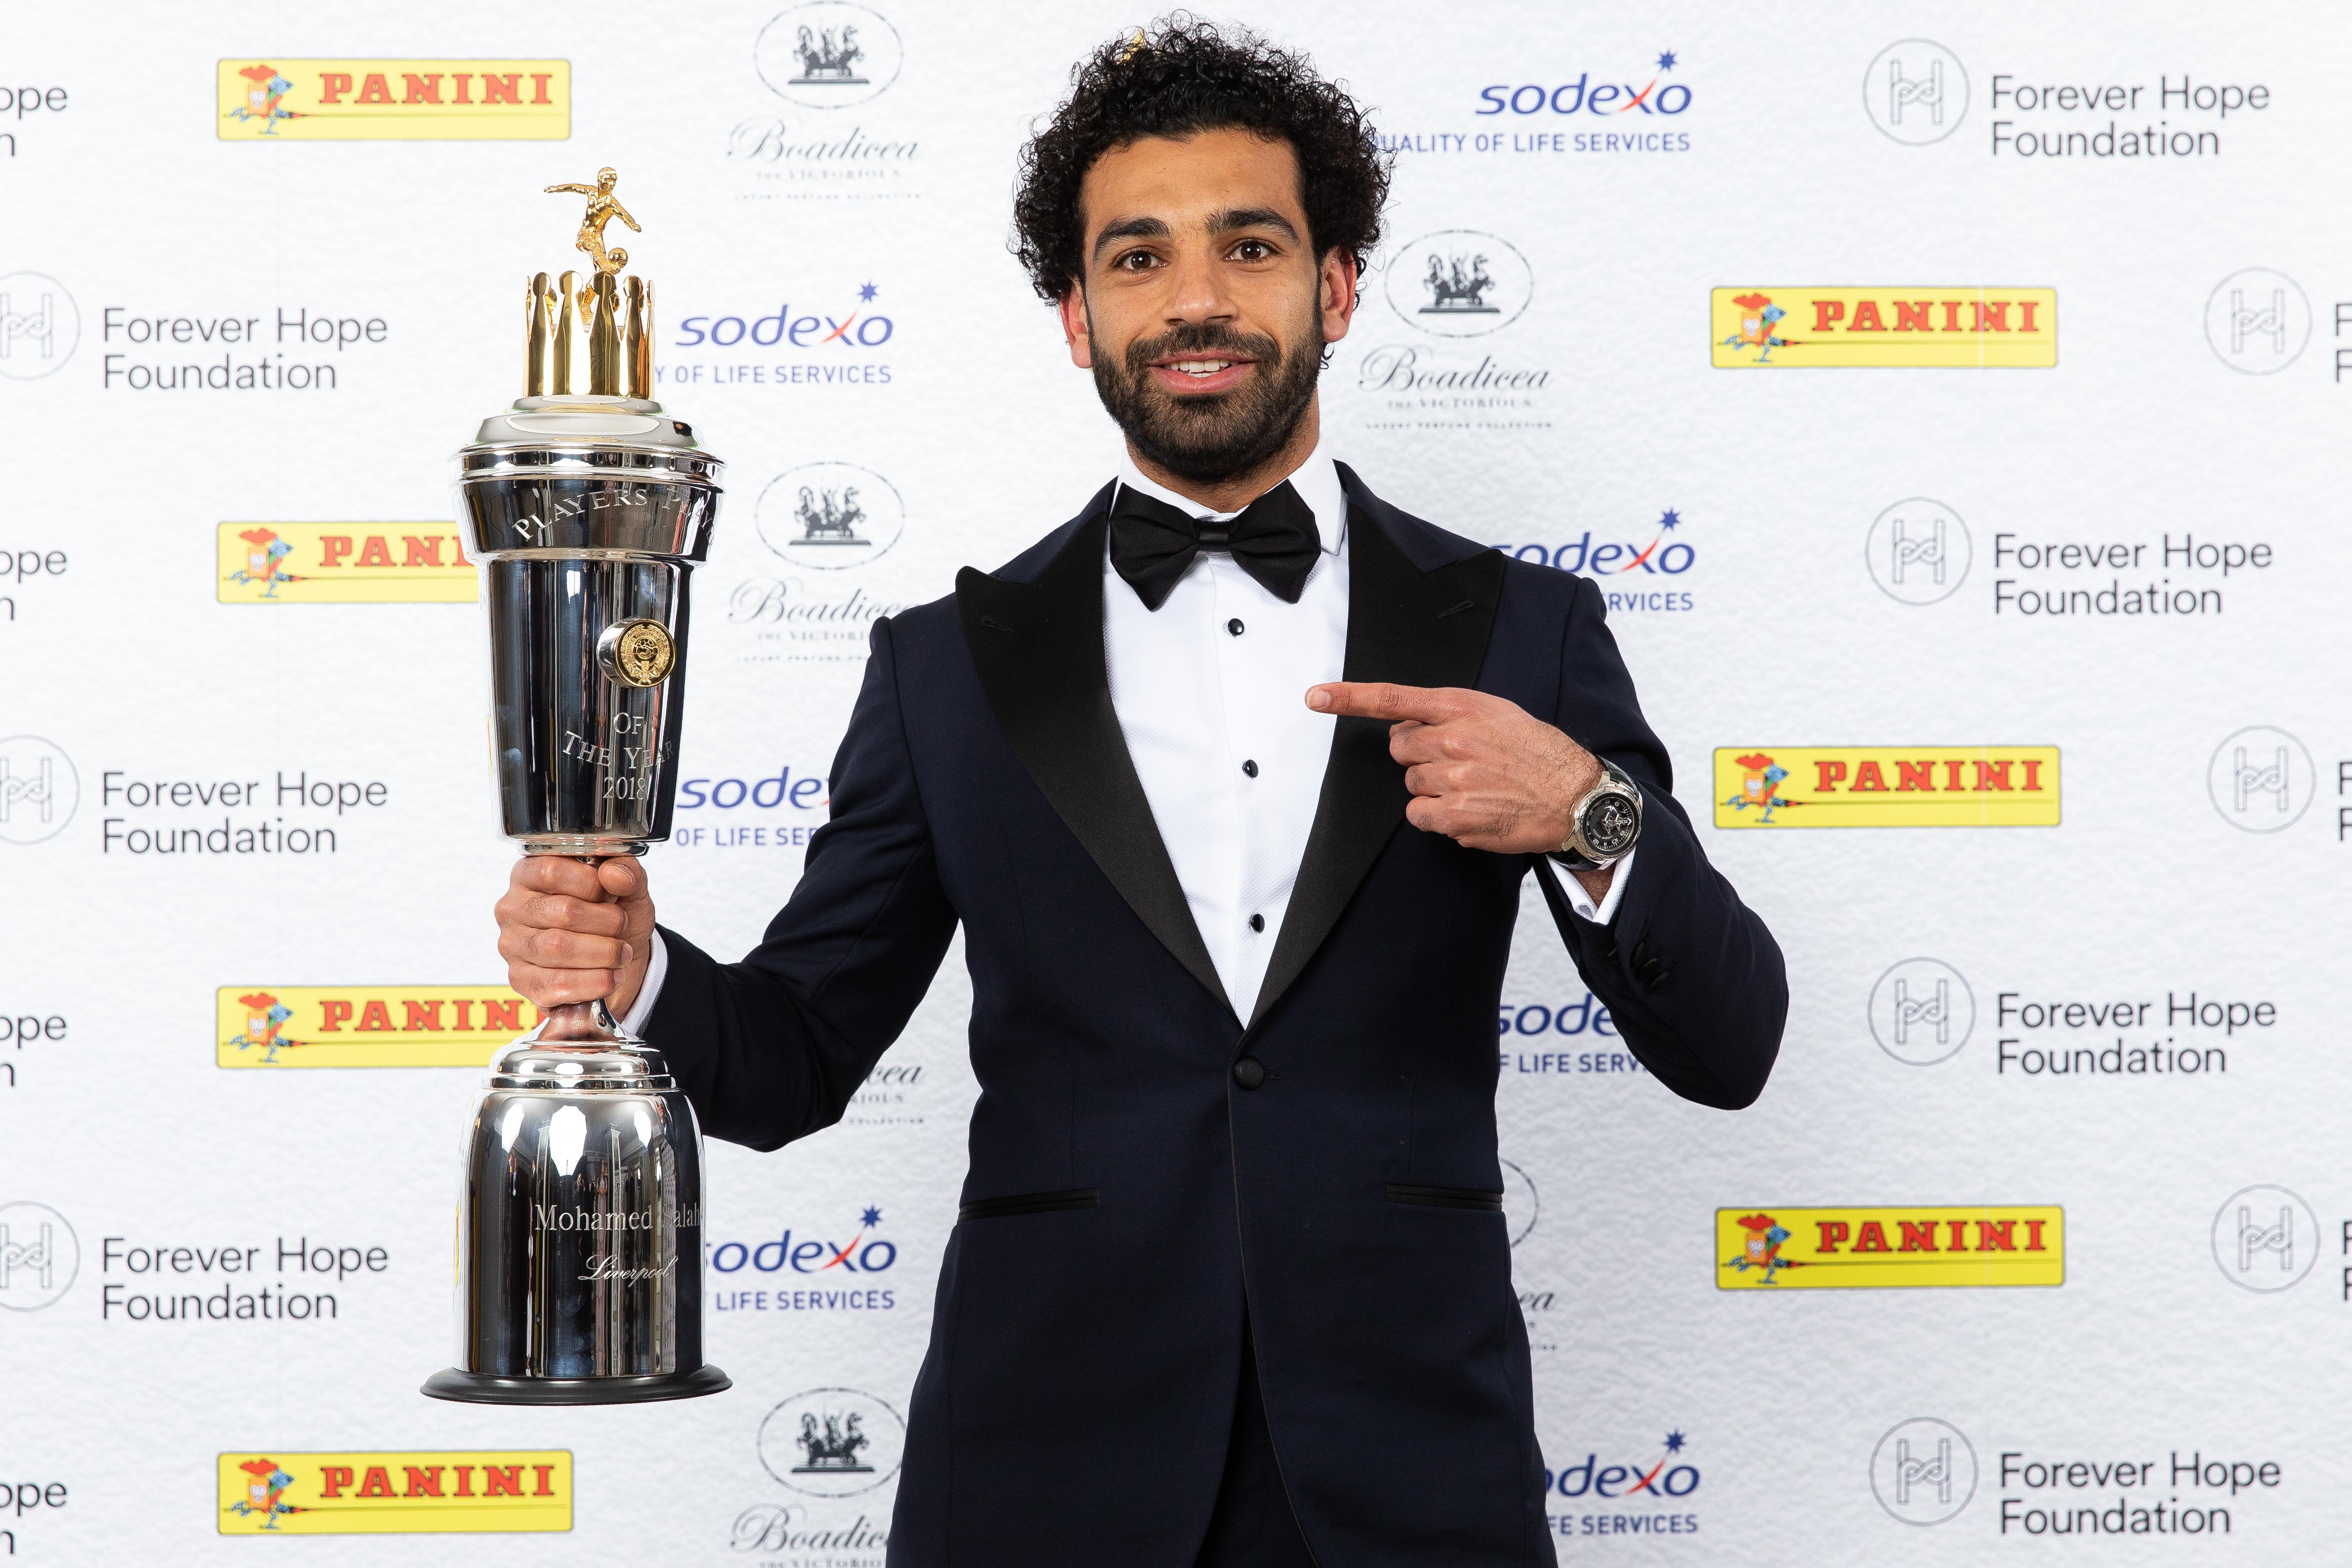 Fans baffled as Liverpool star Salah goes offline